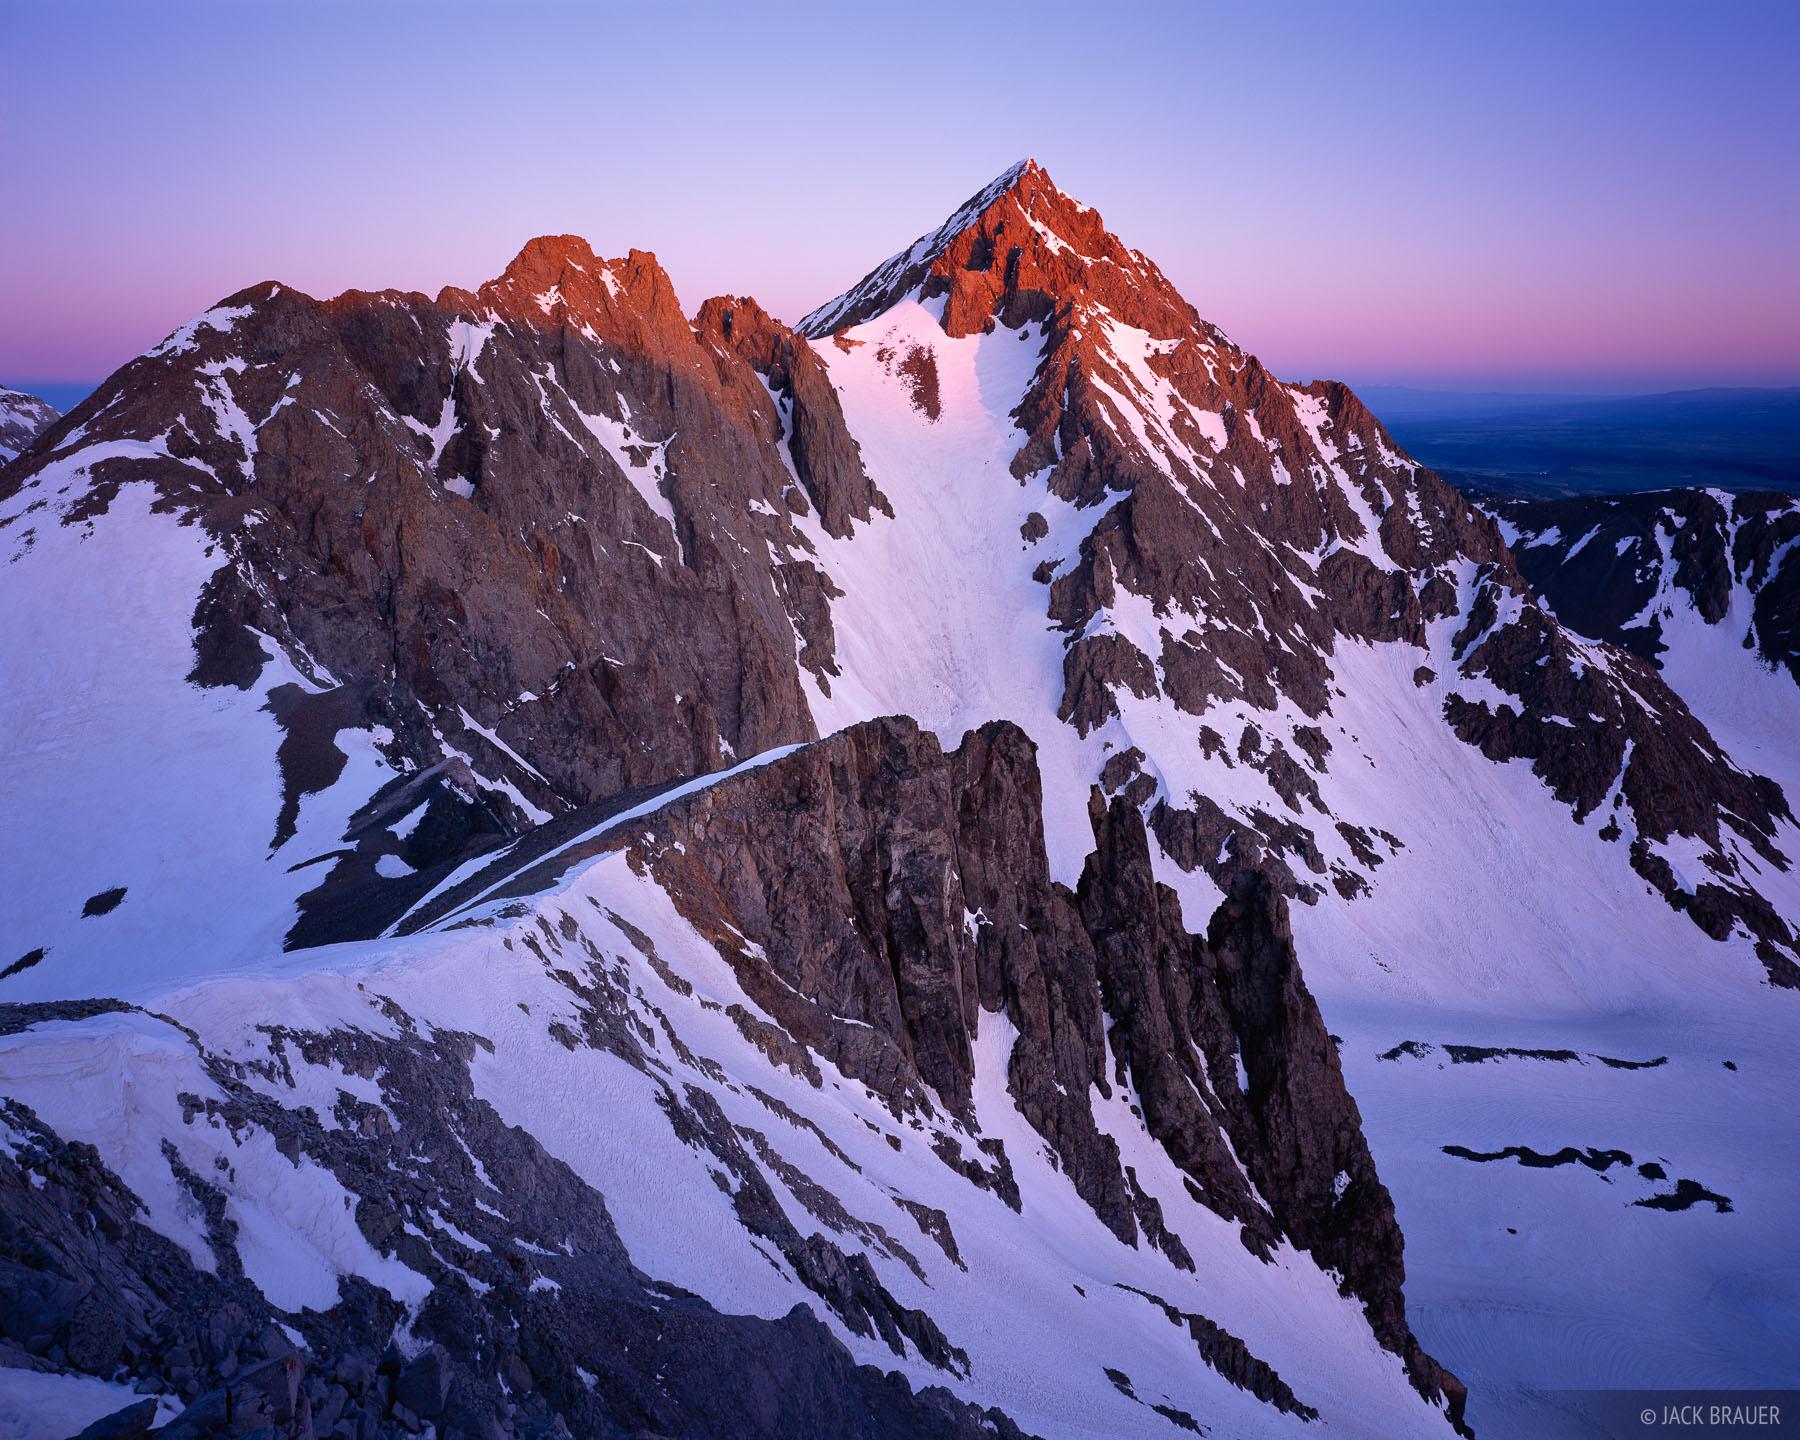 Alpenglow, Mt. Sneffels, San Juan Mountains, Colorado, photo